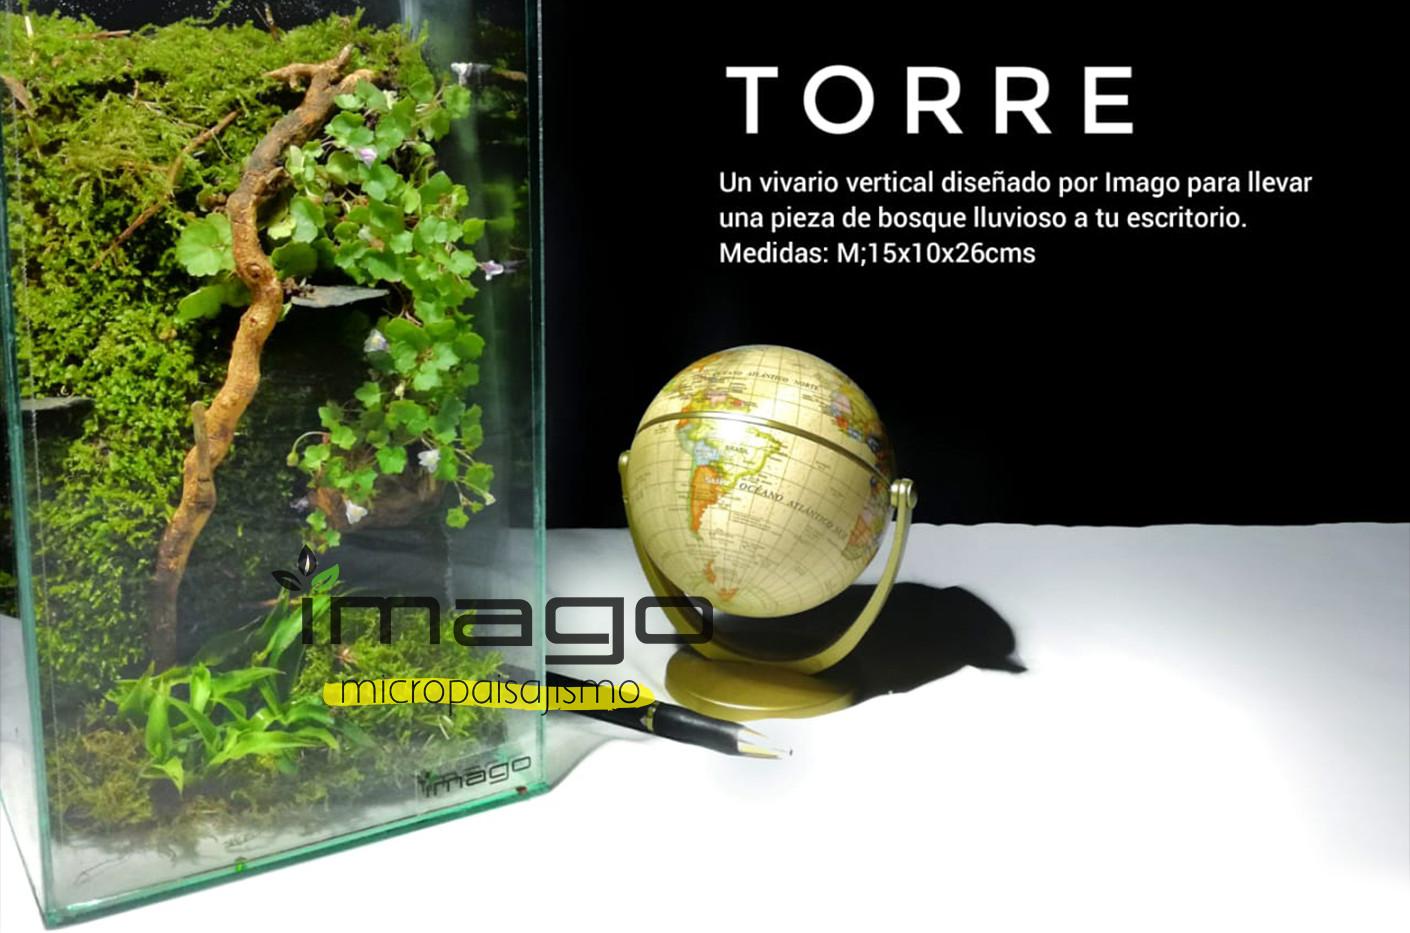 PortadaTorre.jpg